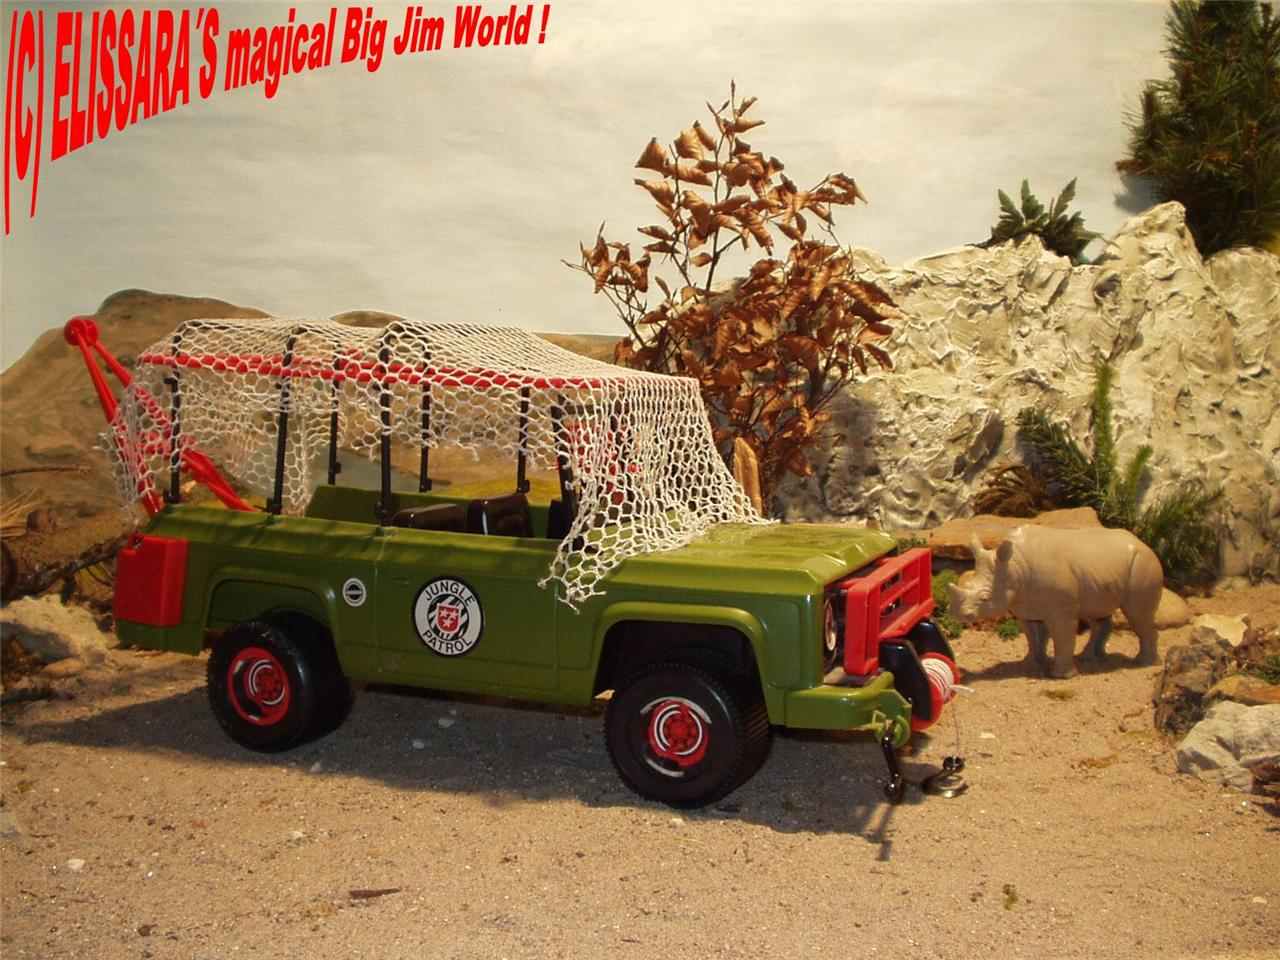 big jim safari jeep jungle truck rhino baby etc ebay. Black Bedroom Furniture Sets. Home Design Ideas